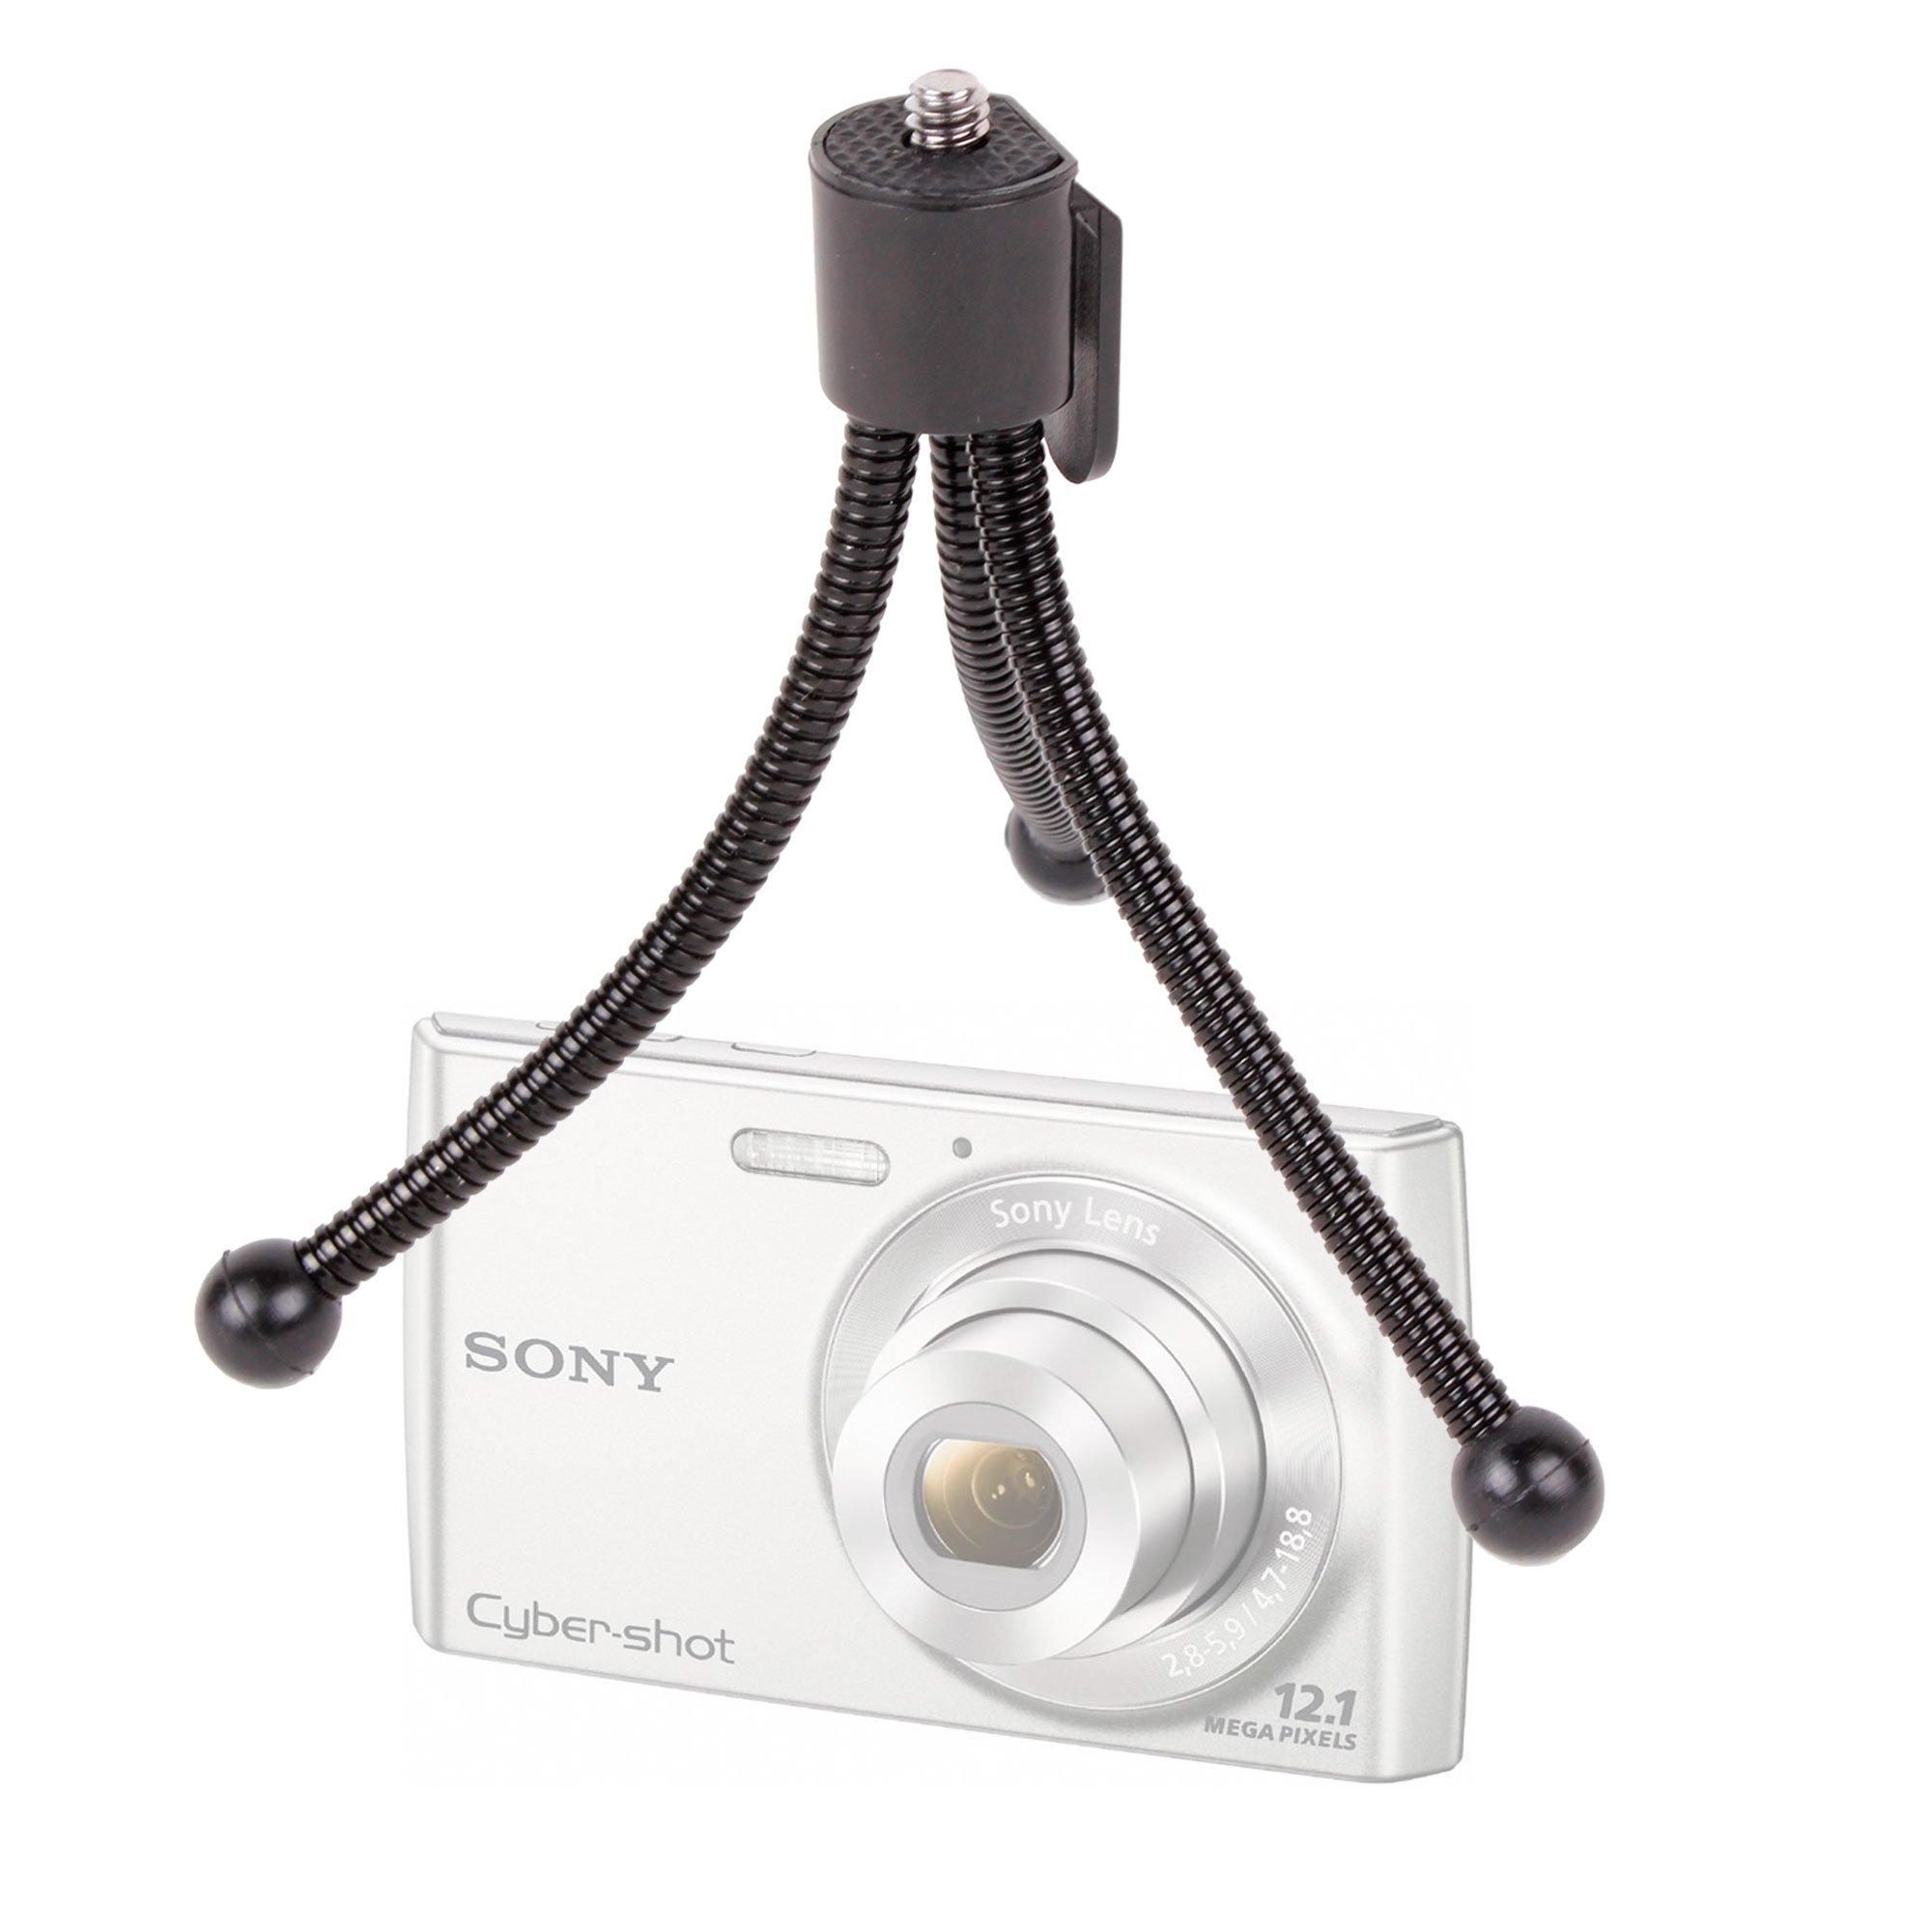 DURAGADGET Collapsible Miniature Digital Camera Tripod For Sony Cyber-shot HX20V, RX100 & DSC-HX9V